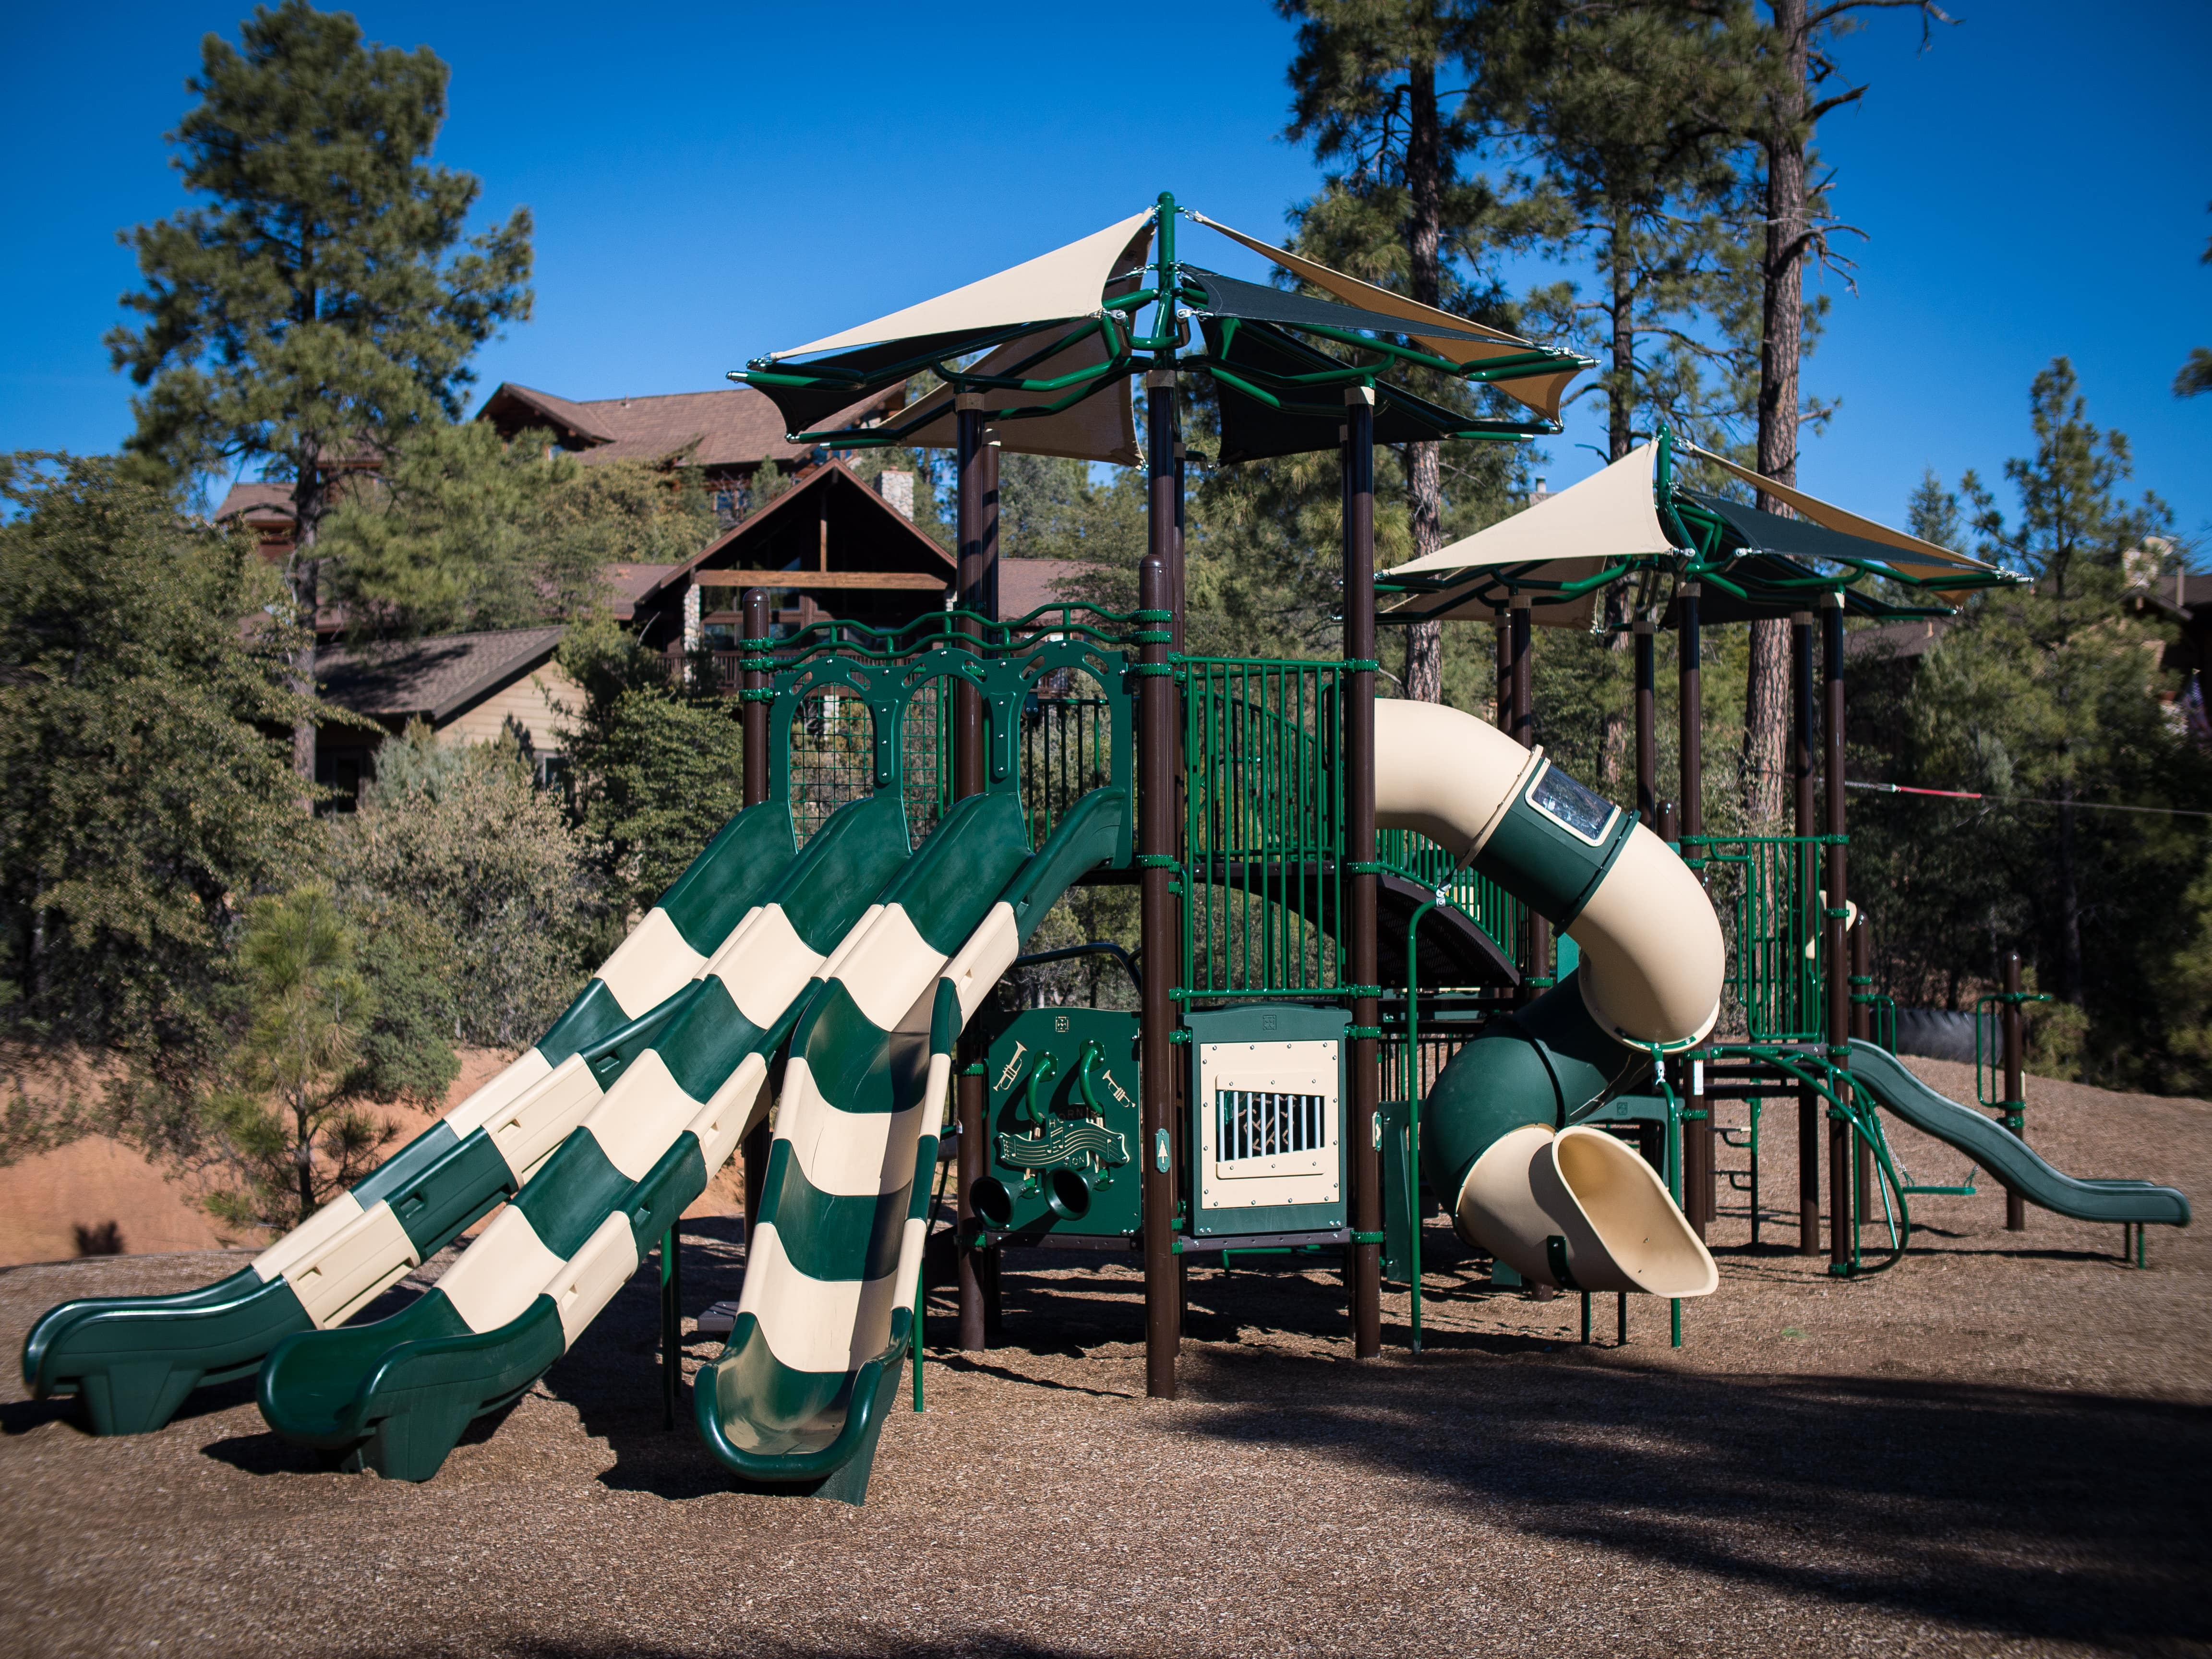 a green playground